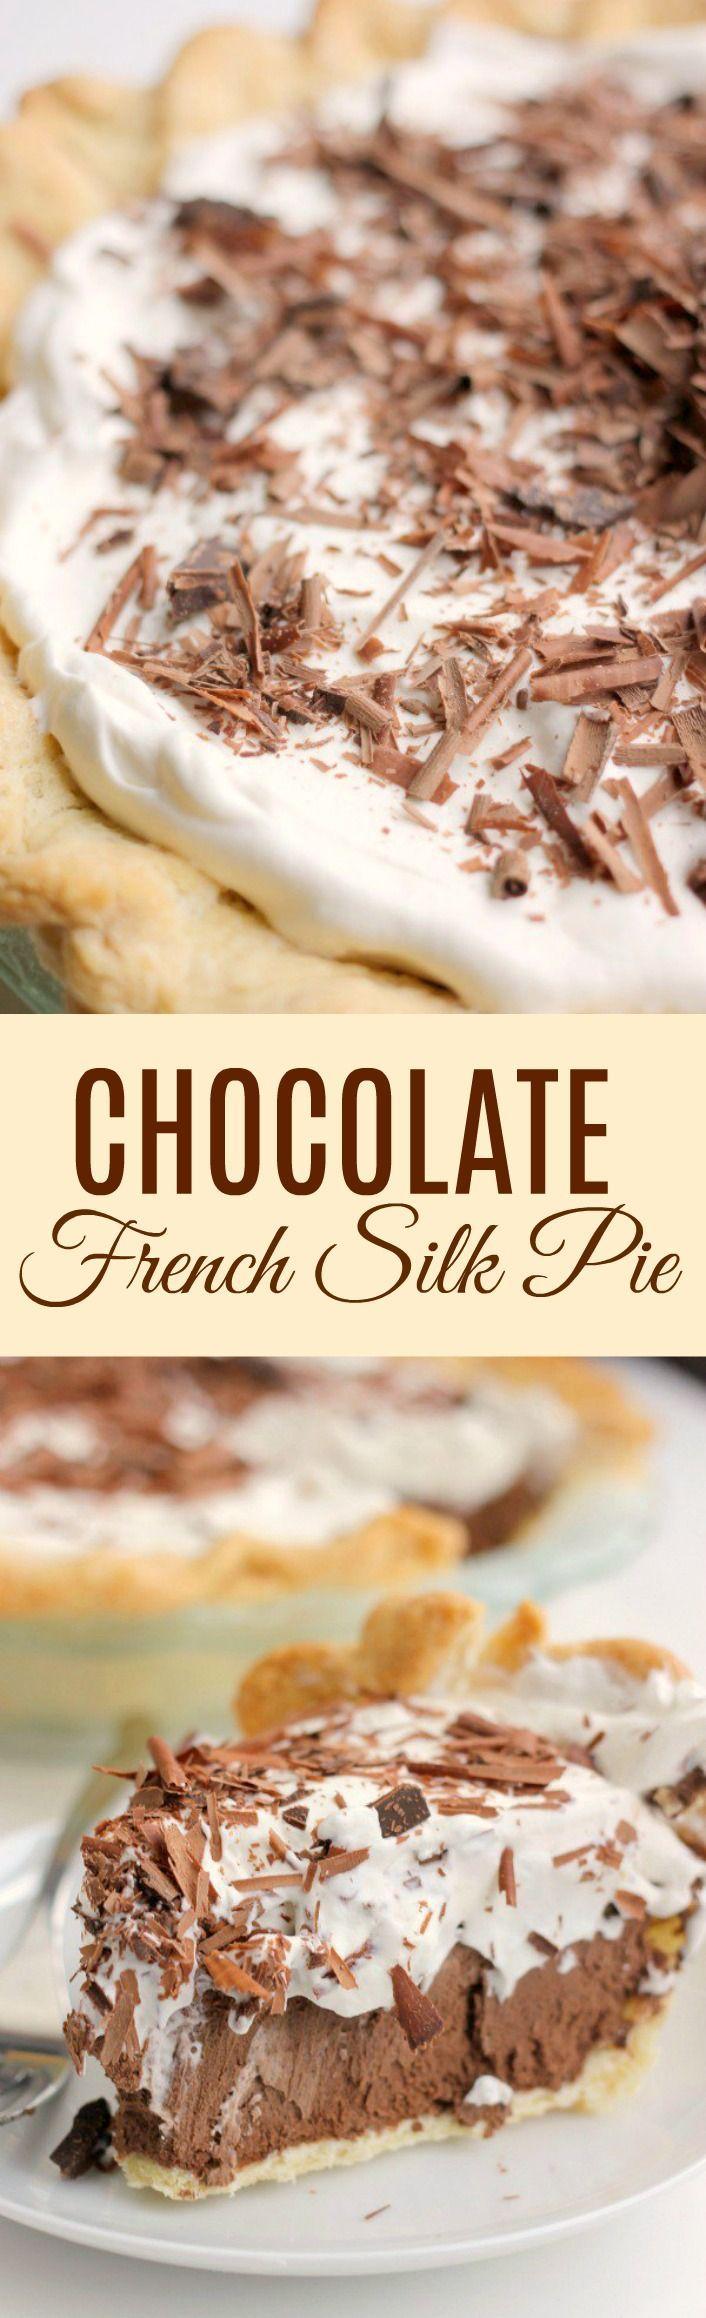 Easy Chocolate French Silk Pie Recipe